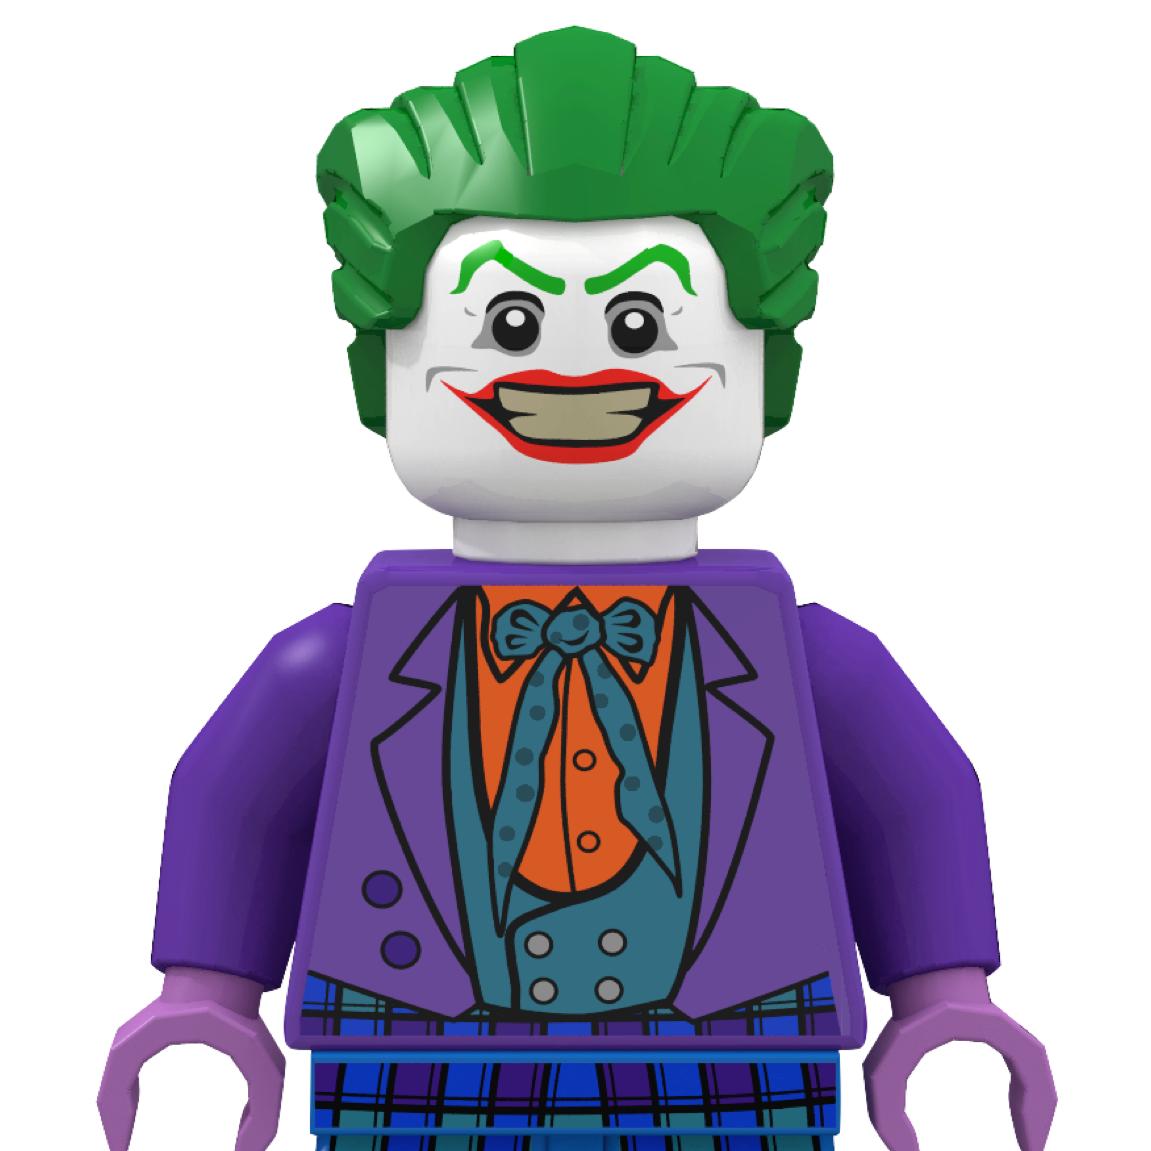 Batman clipart batman joker. Lego movie villain designs